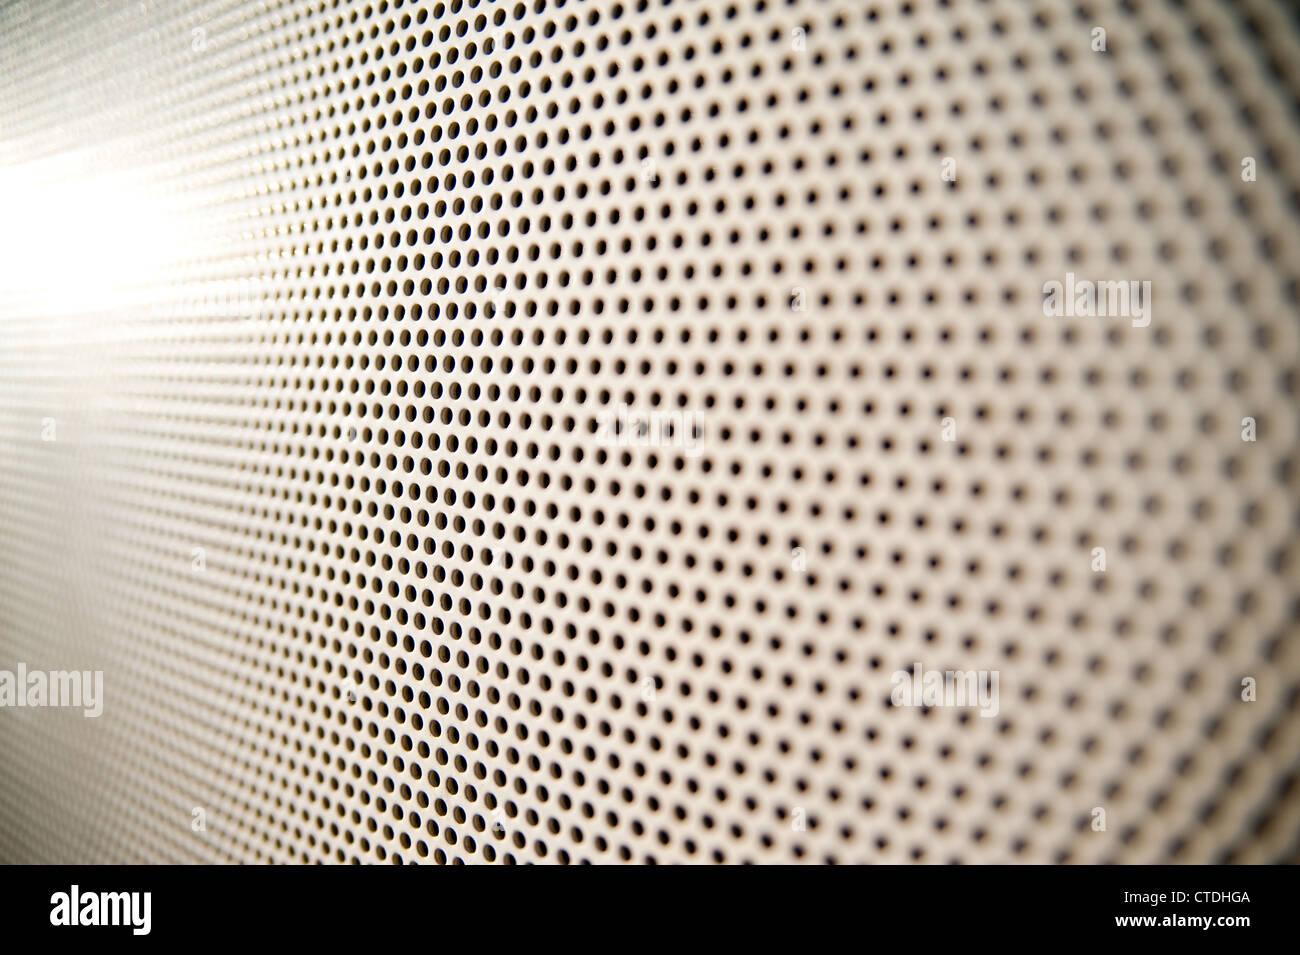 Nahaufnahme von Lochmuster mit selektiven Fokus Stockbild